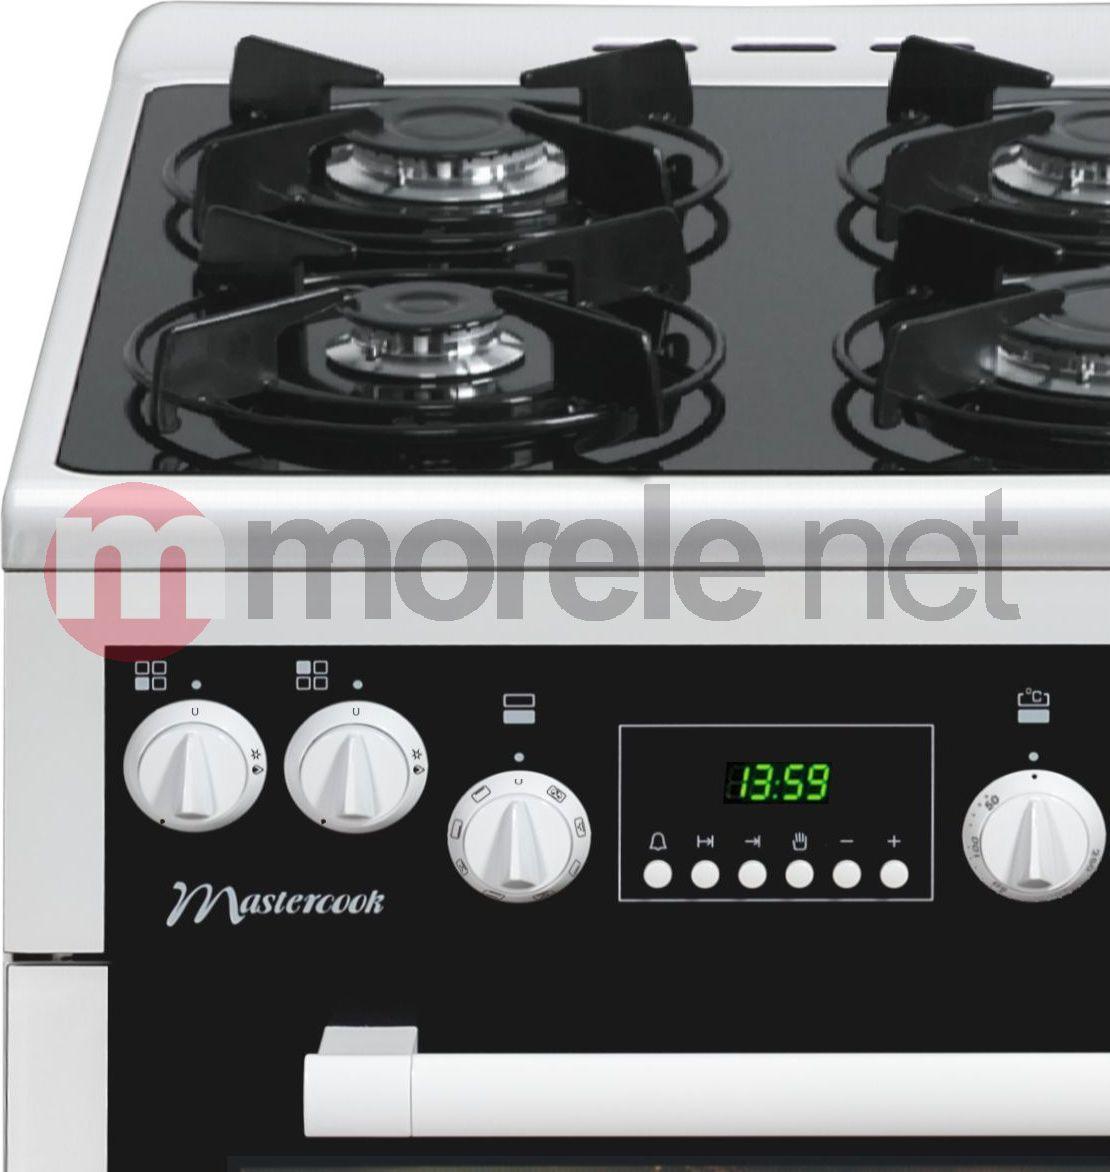 KGE 3490 B FUTURE w Morele net -> Kuchnia Gazowo Elektryczna Mastercook Elegance